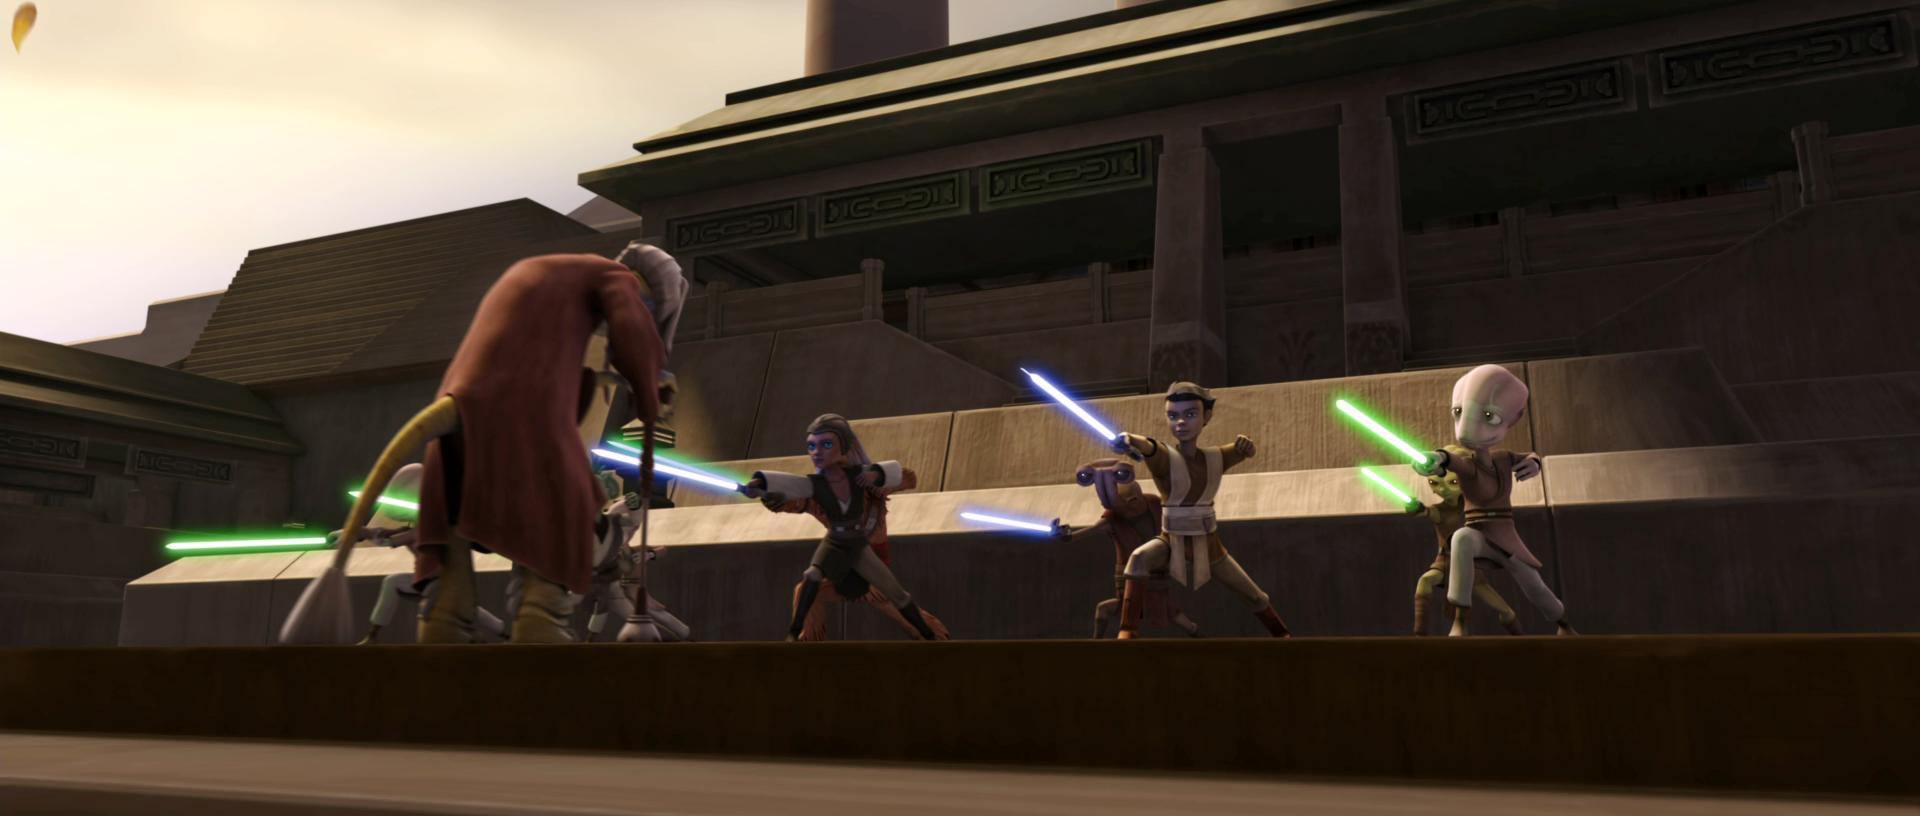 Jedi Temple training ground/Legends